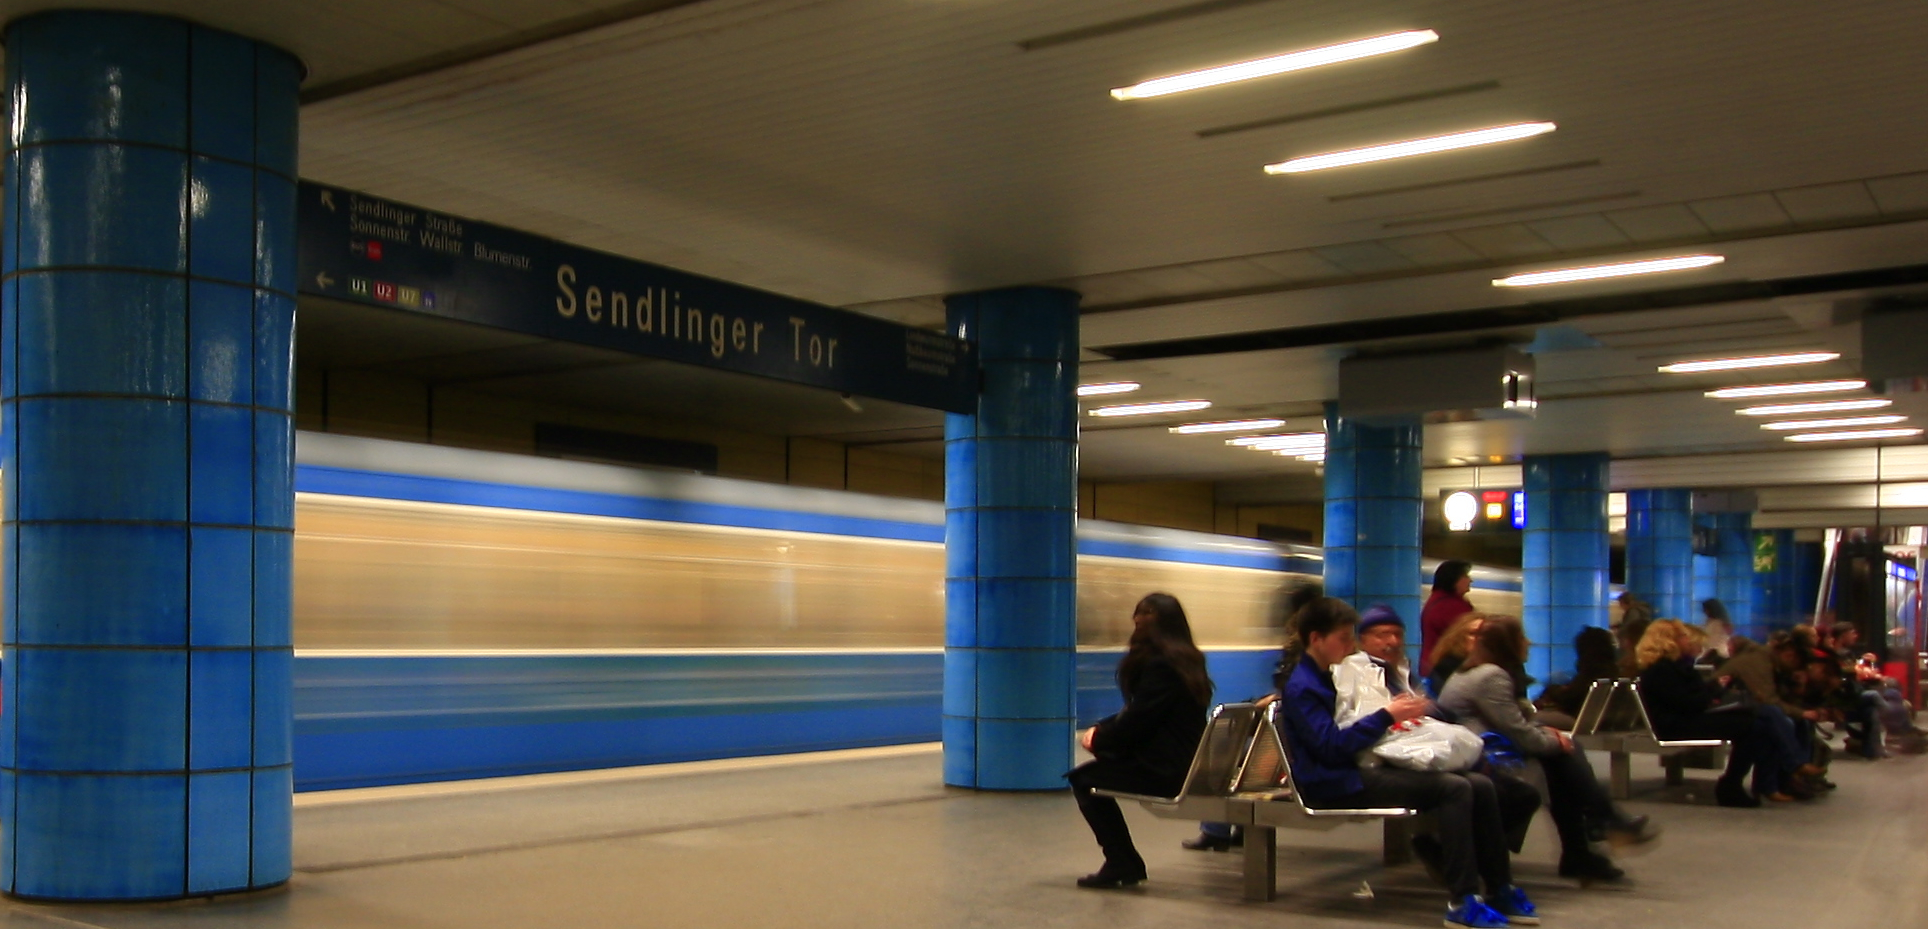 U-Bahn Sendlinger Tor, München